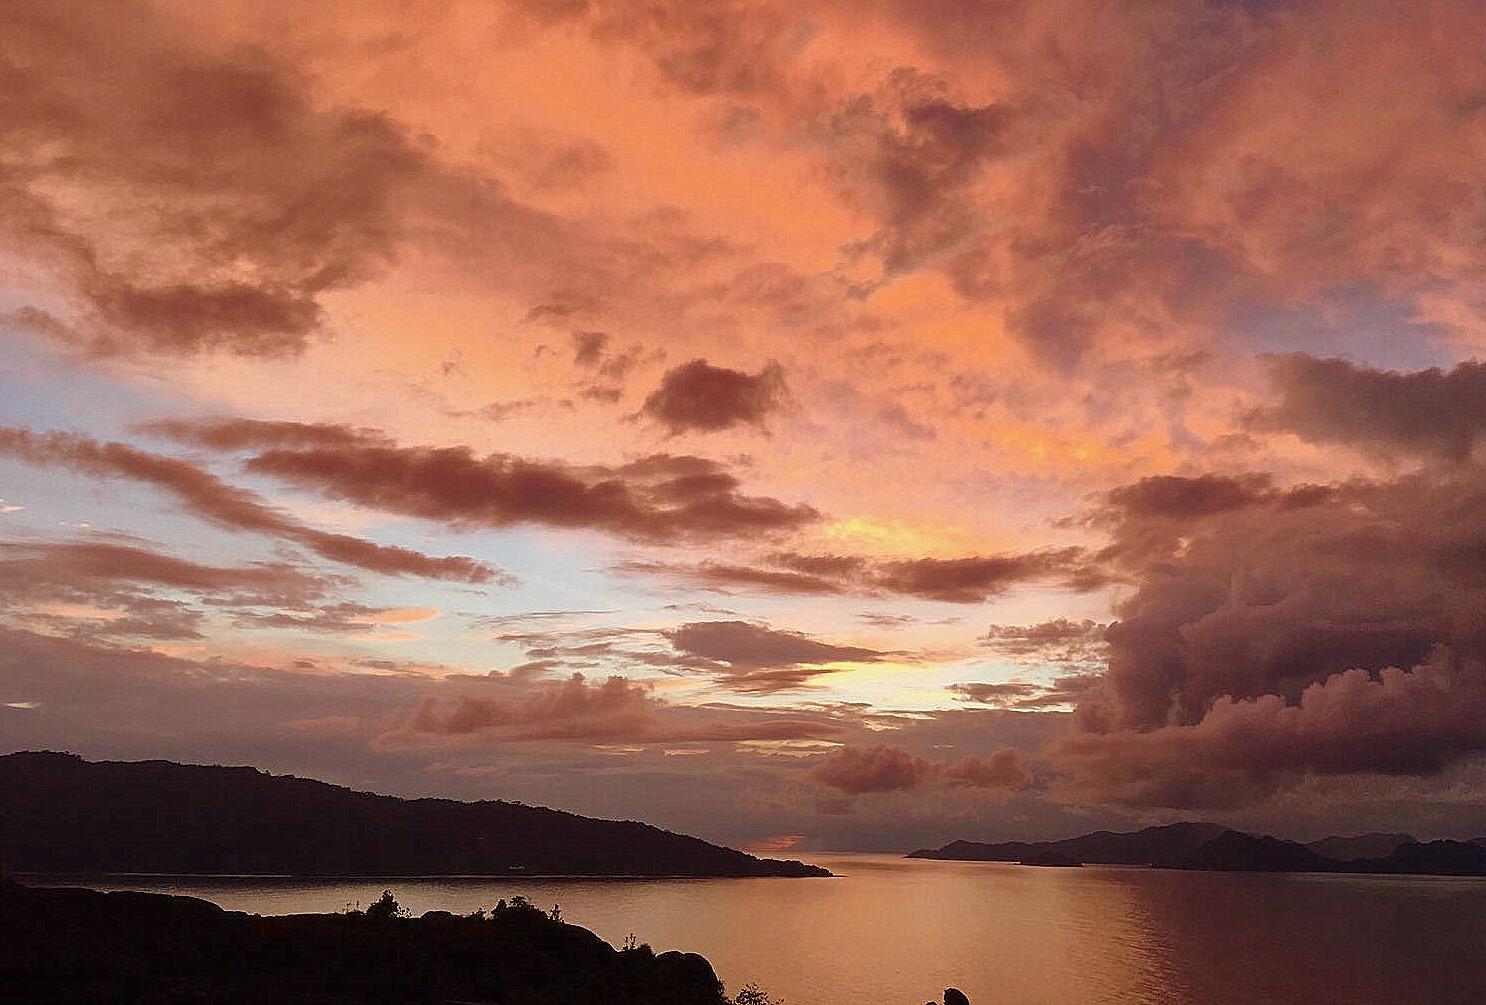 Six Senses Zil Pasyon: Pool Villen mit Ausblick auf den Indischen Ozean strand sonne seychellen new honeymoon 2  TUI Berlin Reisebüro Seychellen Felicité